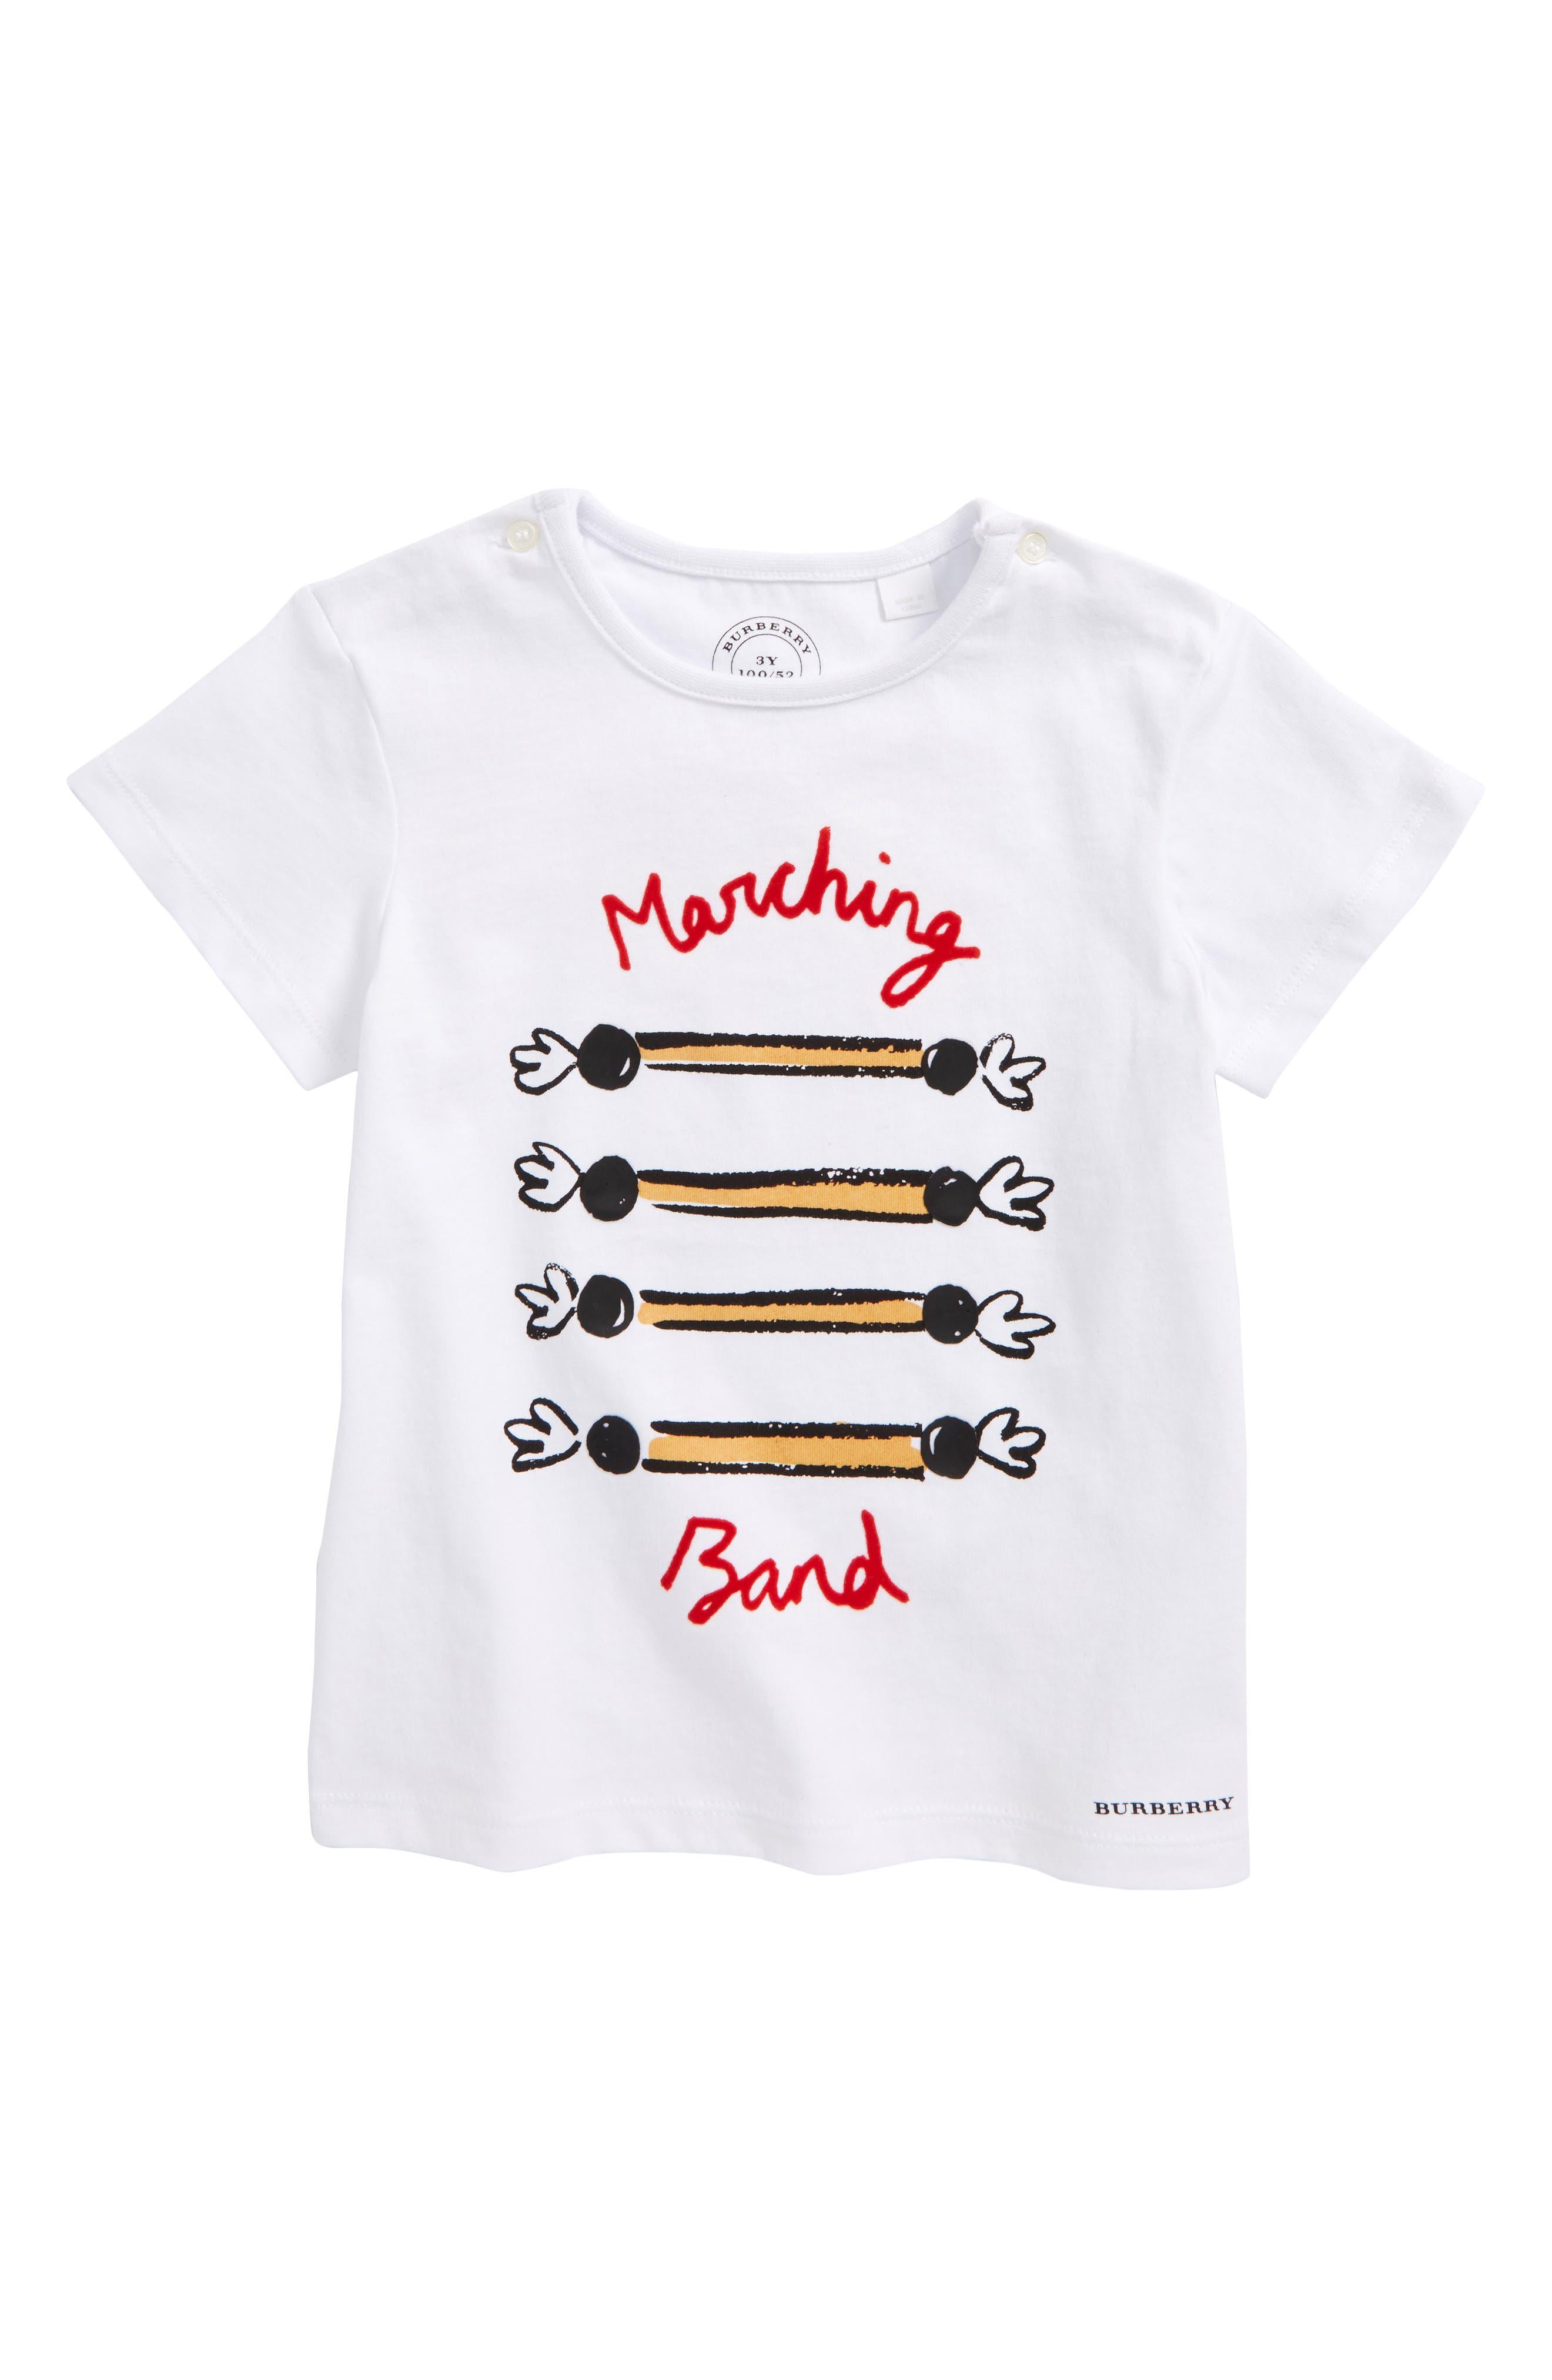 Marching Band Tee,                             Main thumbnail 1, color,                             White